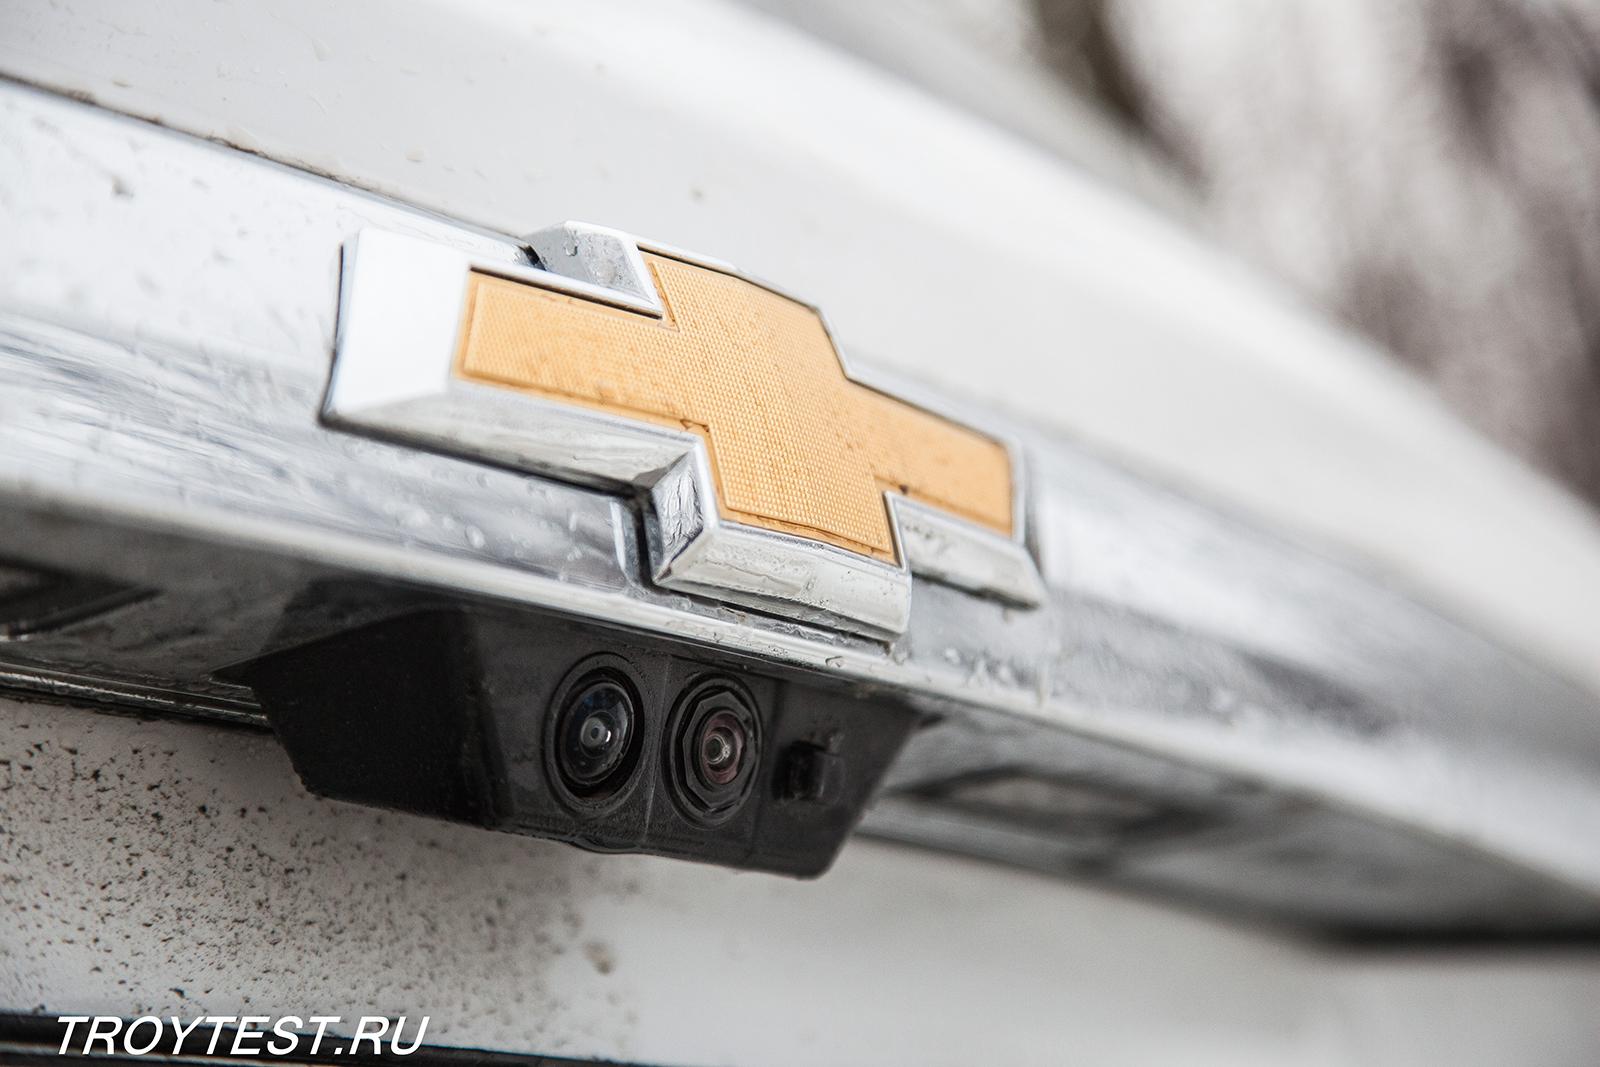 Он вкусно пахнет унисексиком: тест-драйв Chevrolet Traverse 3,6 V6 (318 л.с.) AT AWD